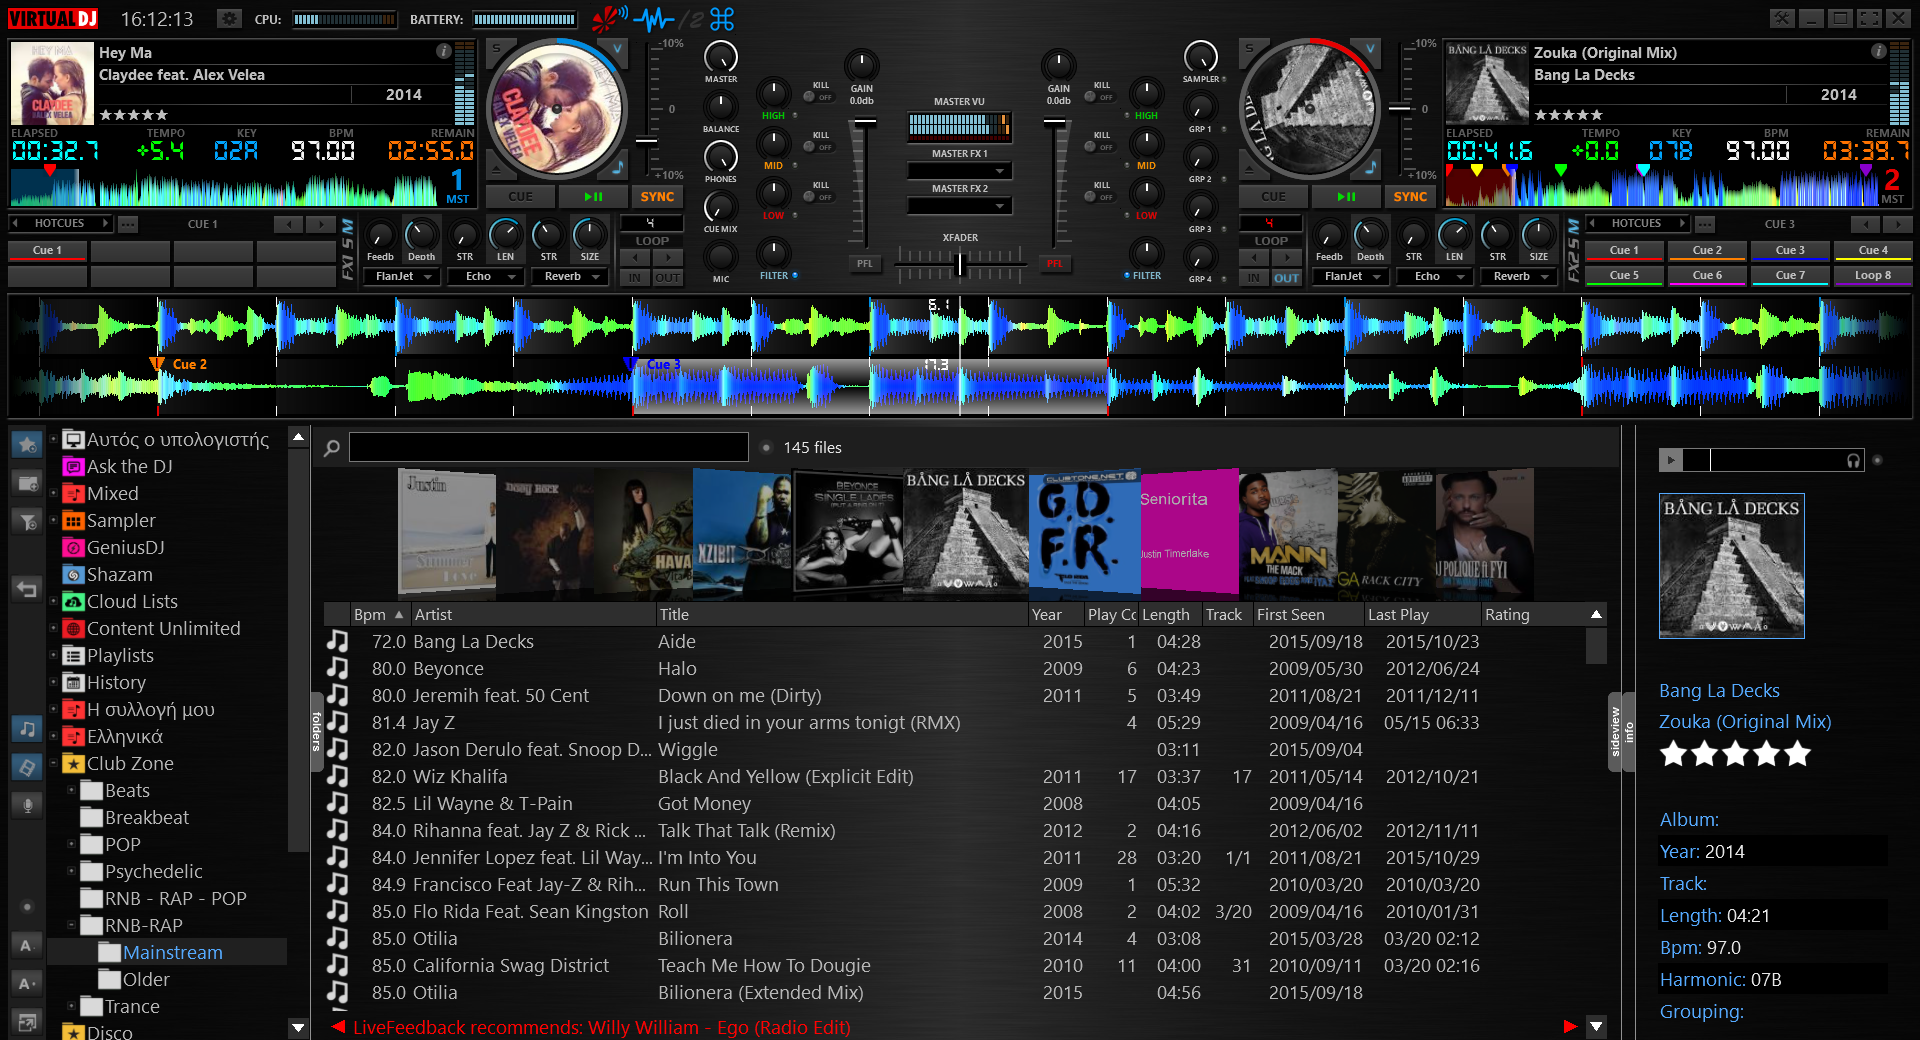 Download virtual dj for pc highly compressed | Virtual DJ